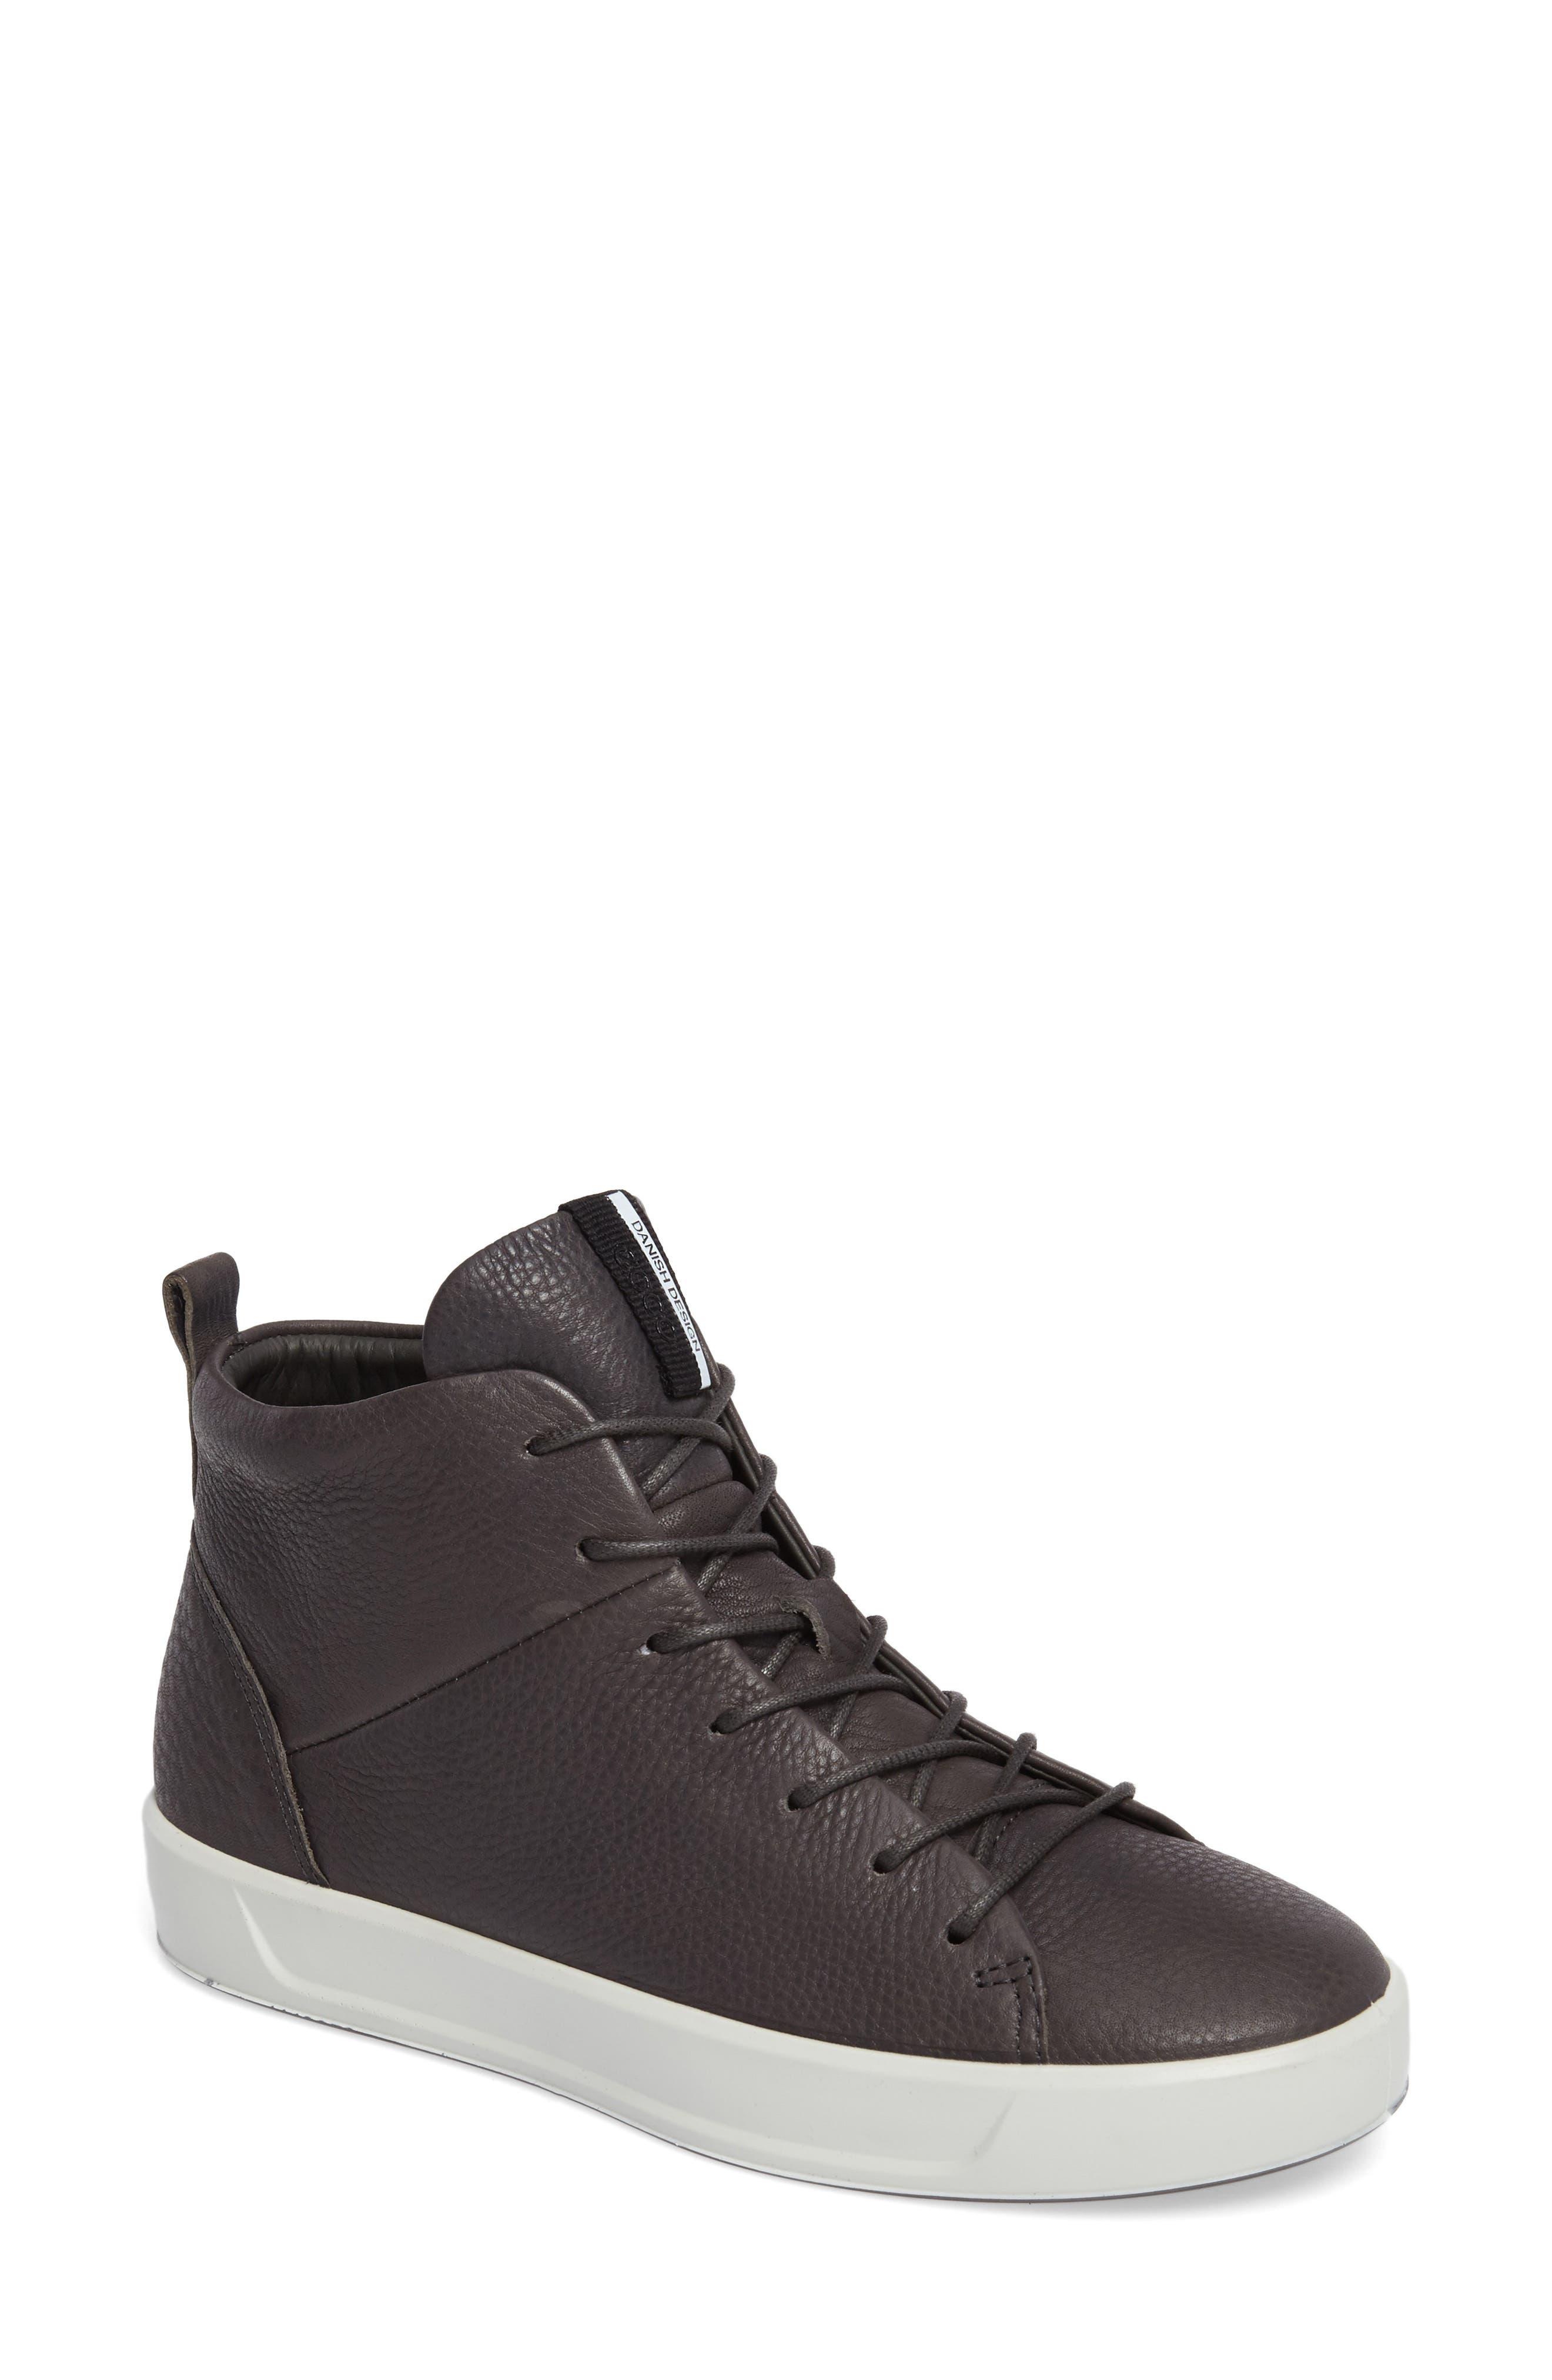 ECCO Soft 8 High Top Sneaker (Women)